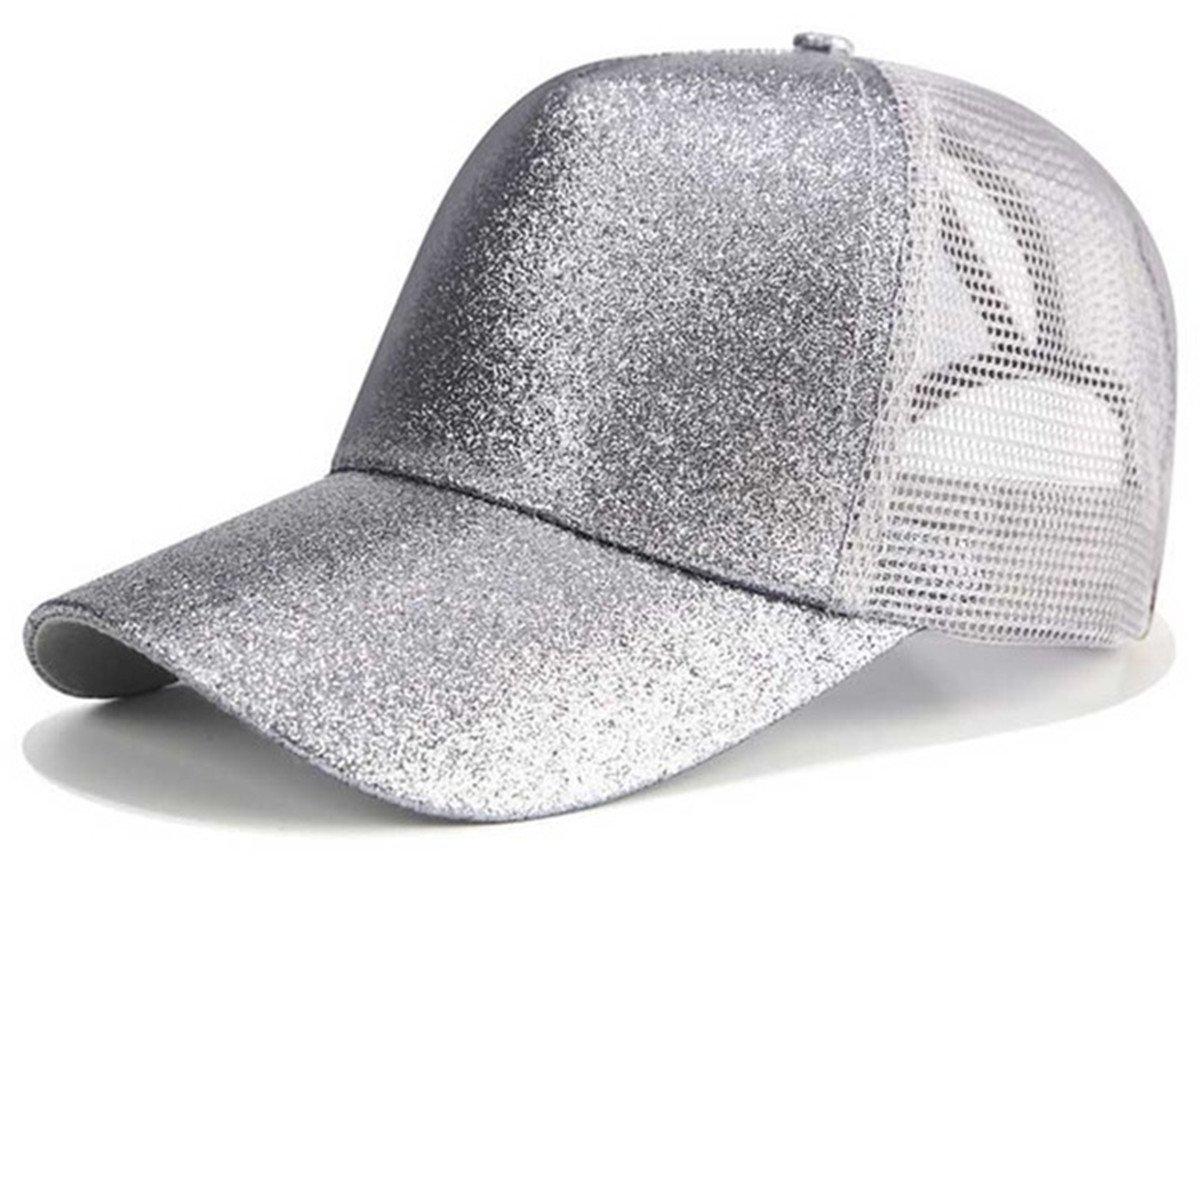 D Symphony Visor Cap, Summer Glither Ponytail Cap Mesh Hats Casual Adjustable Sport Caps Baseball Cap for Women Girls DWE Visor Cap